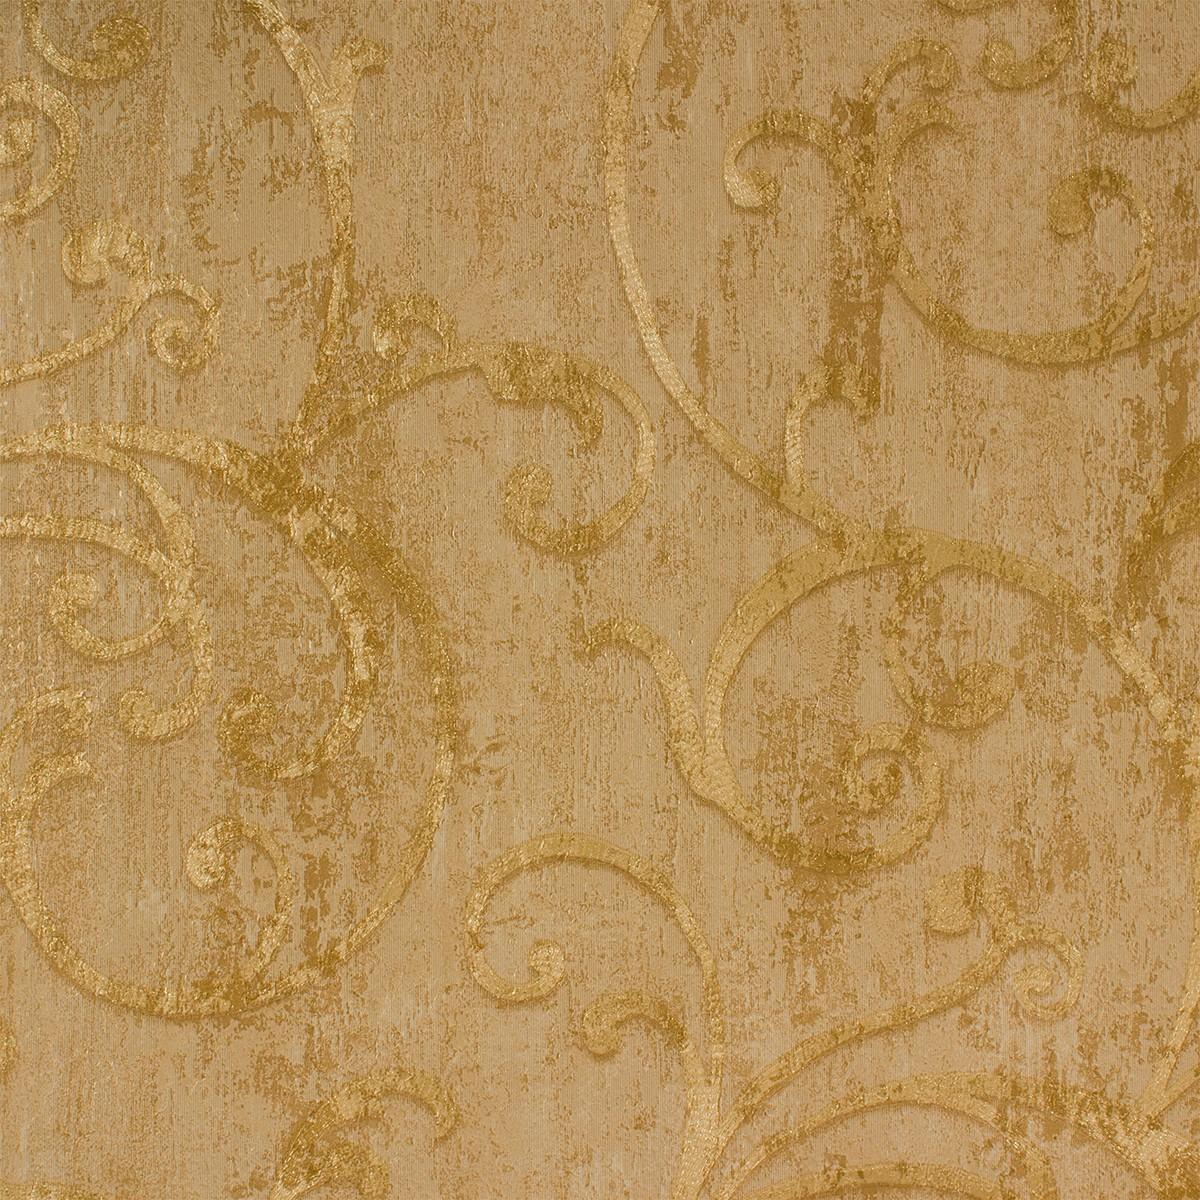 Barock Tapete Auf Leinwand : Tapeten Angelica Barock Struktur gold Tapete Rasch Textil 009533